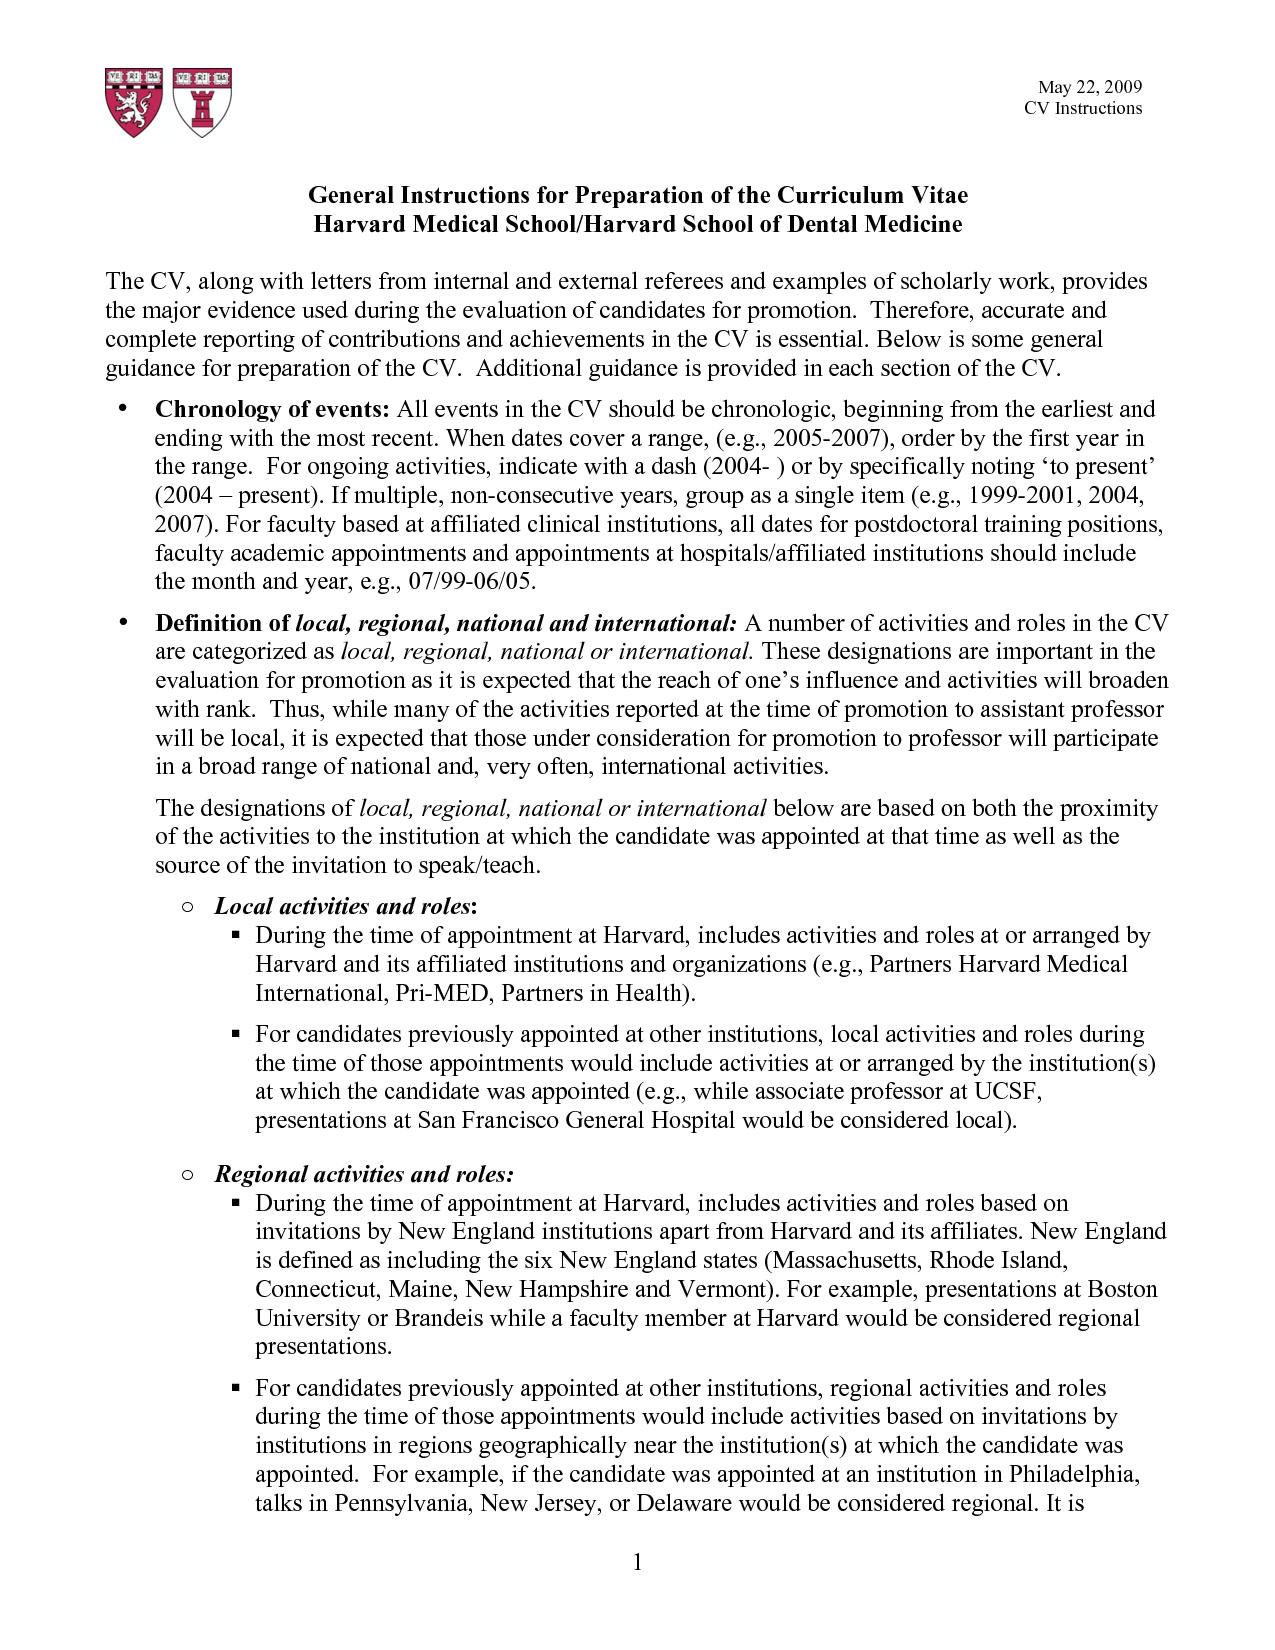 011 Harvard Accepted Essays Essay Example Cv Template Medical School Fantastic Business Reddit College Book Full